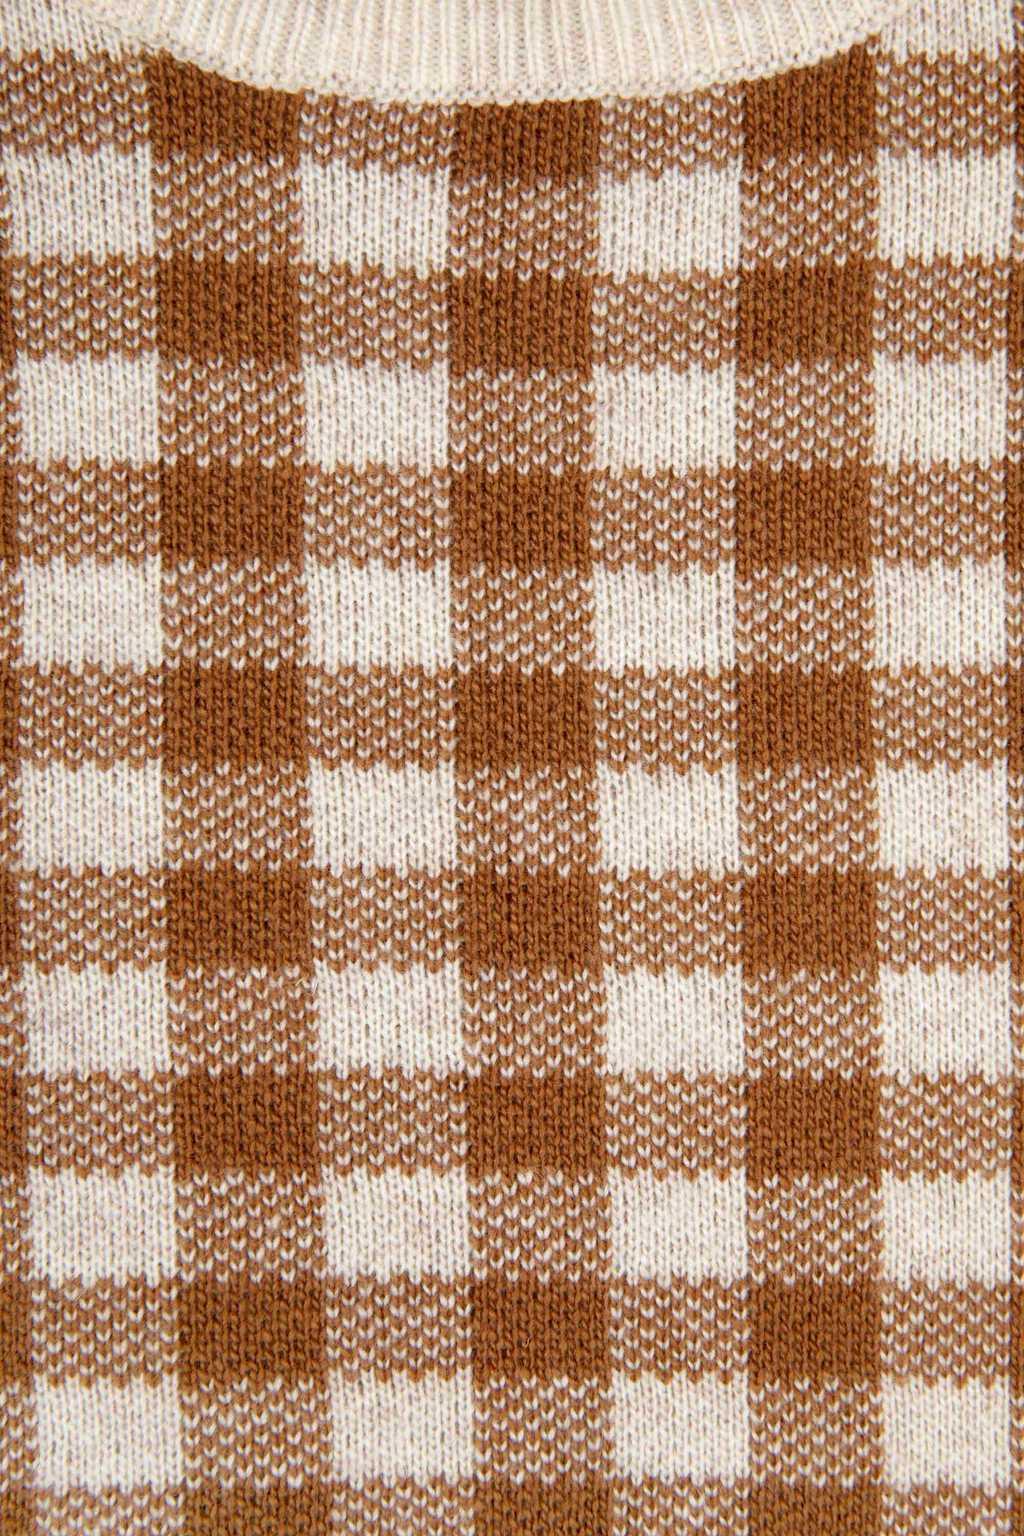 Sweater 3165 Camel 9